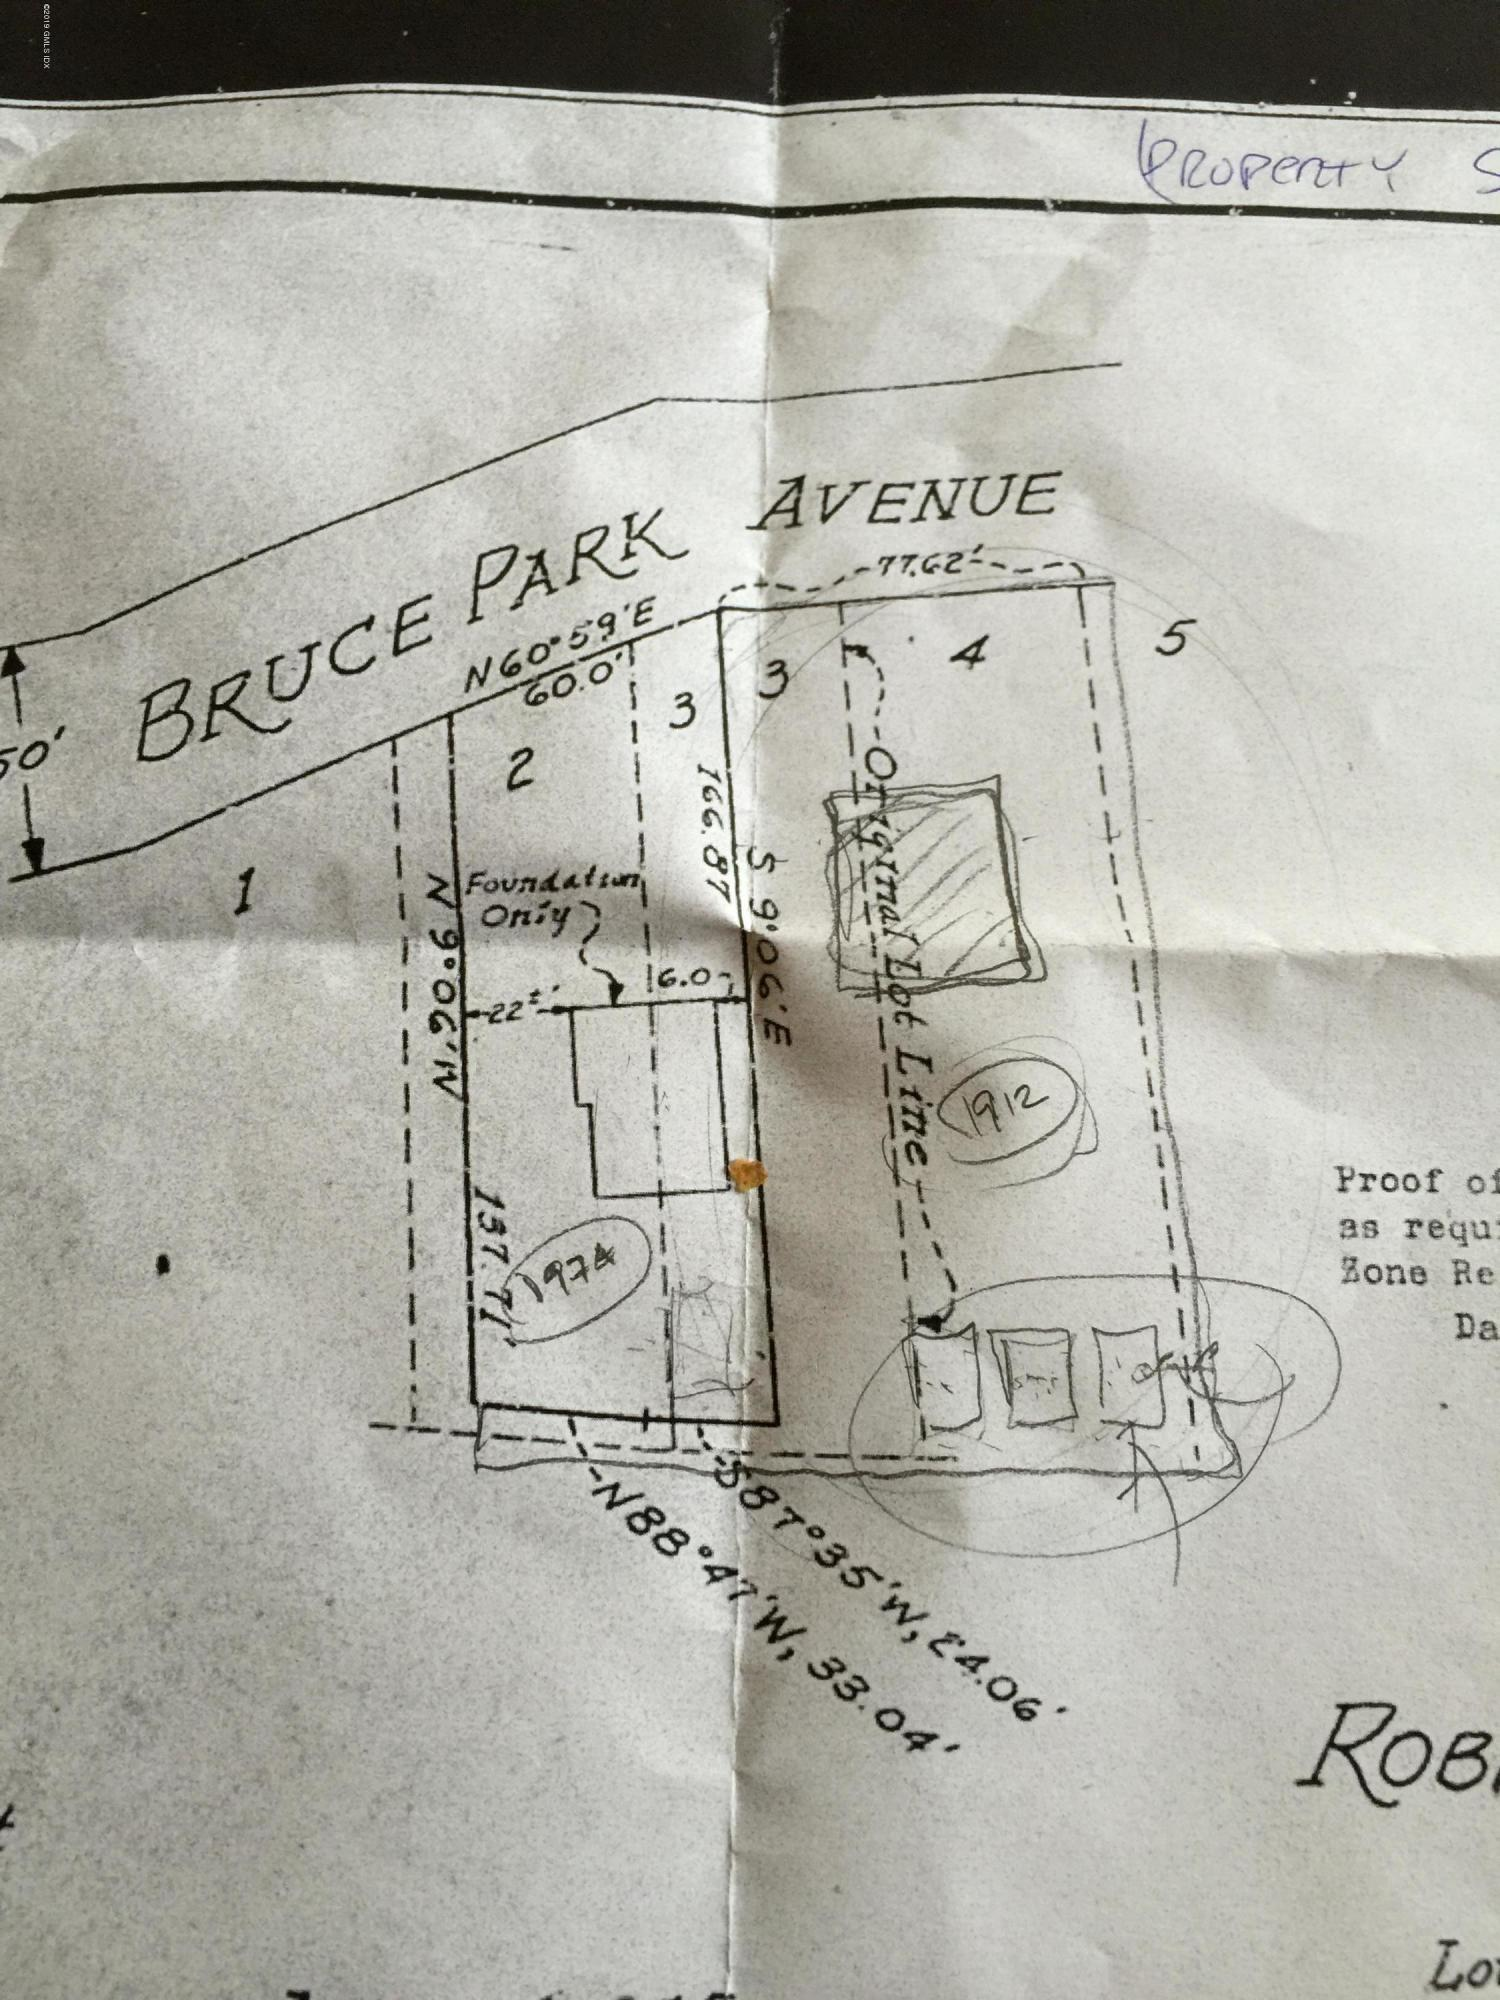 44&42 Bruce Park Avenue,Greenwich,Connecticut 06830,Bruce Park,105240